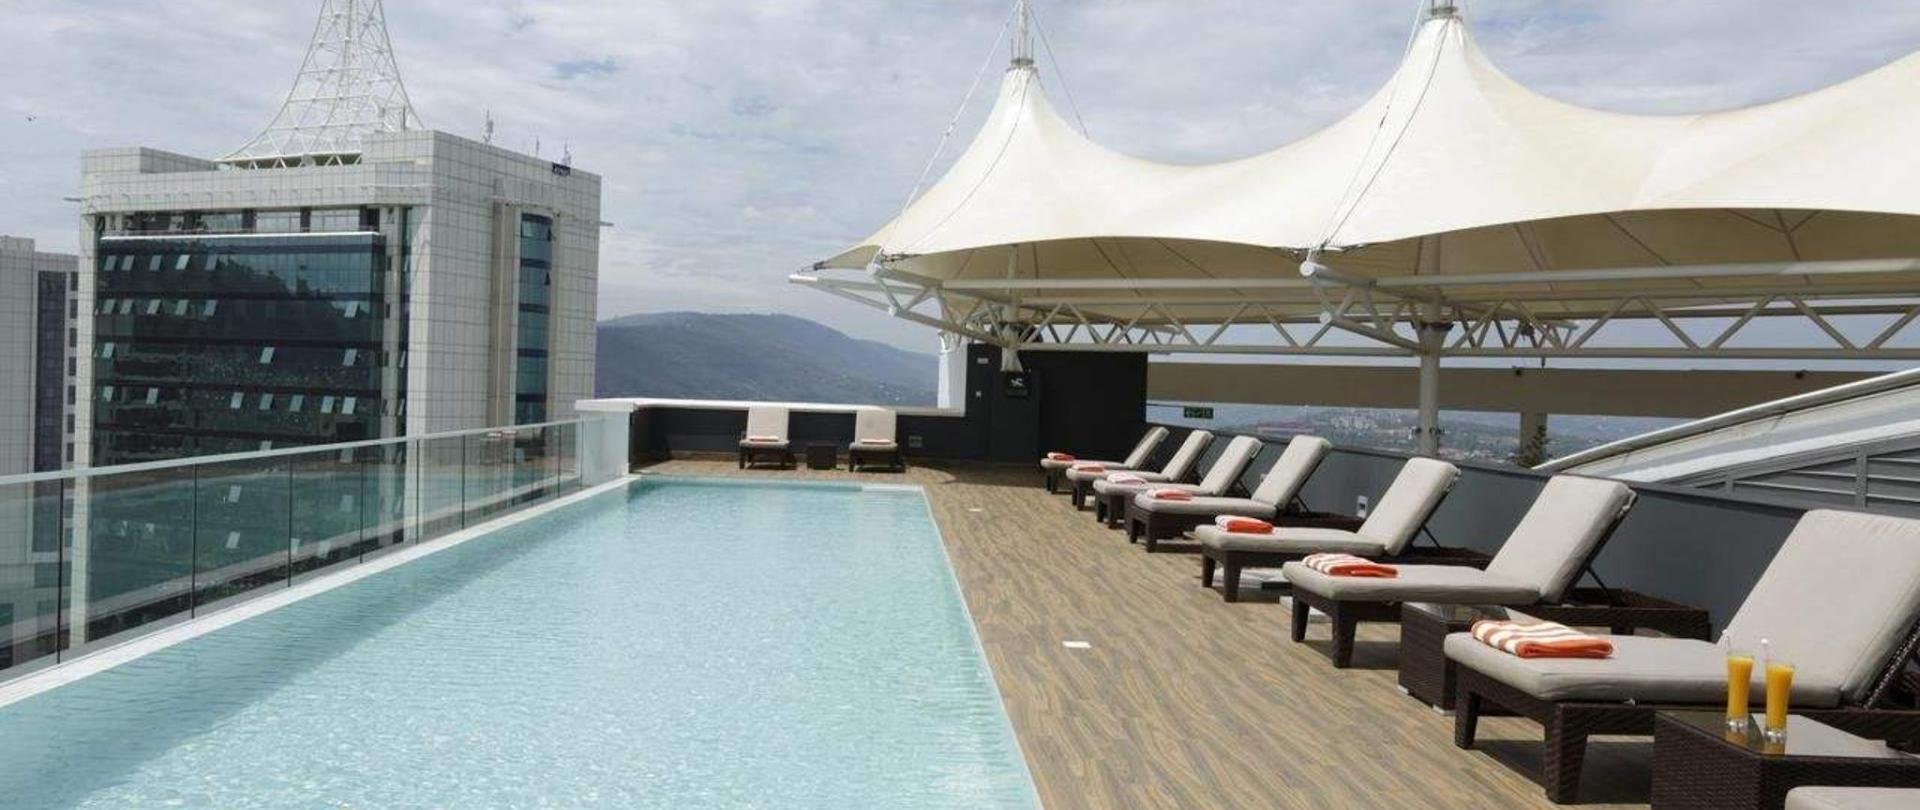 Ubumwe Grande Hotel